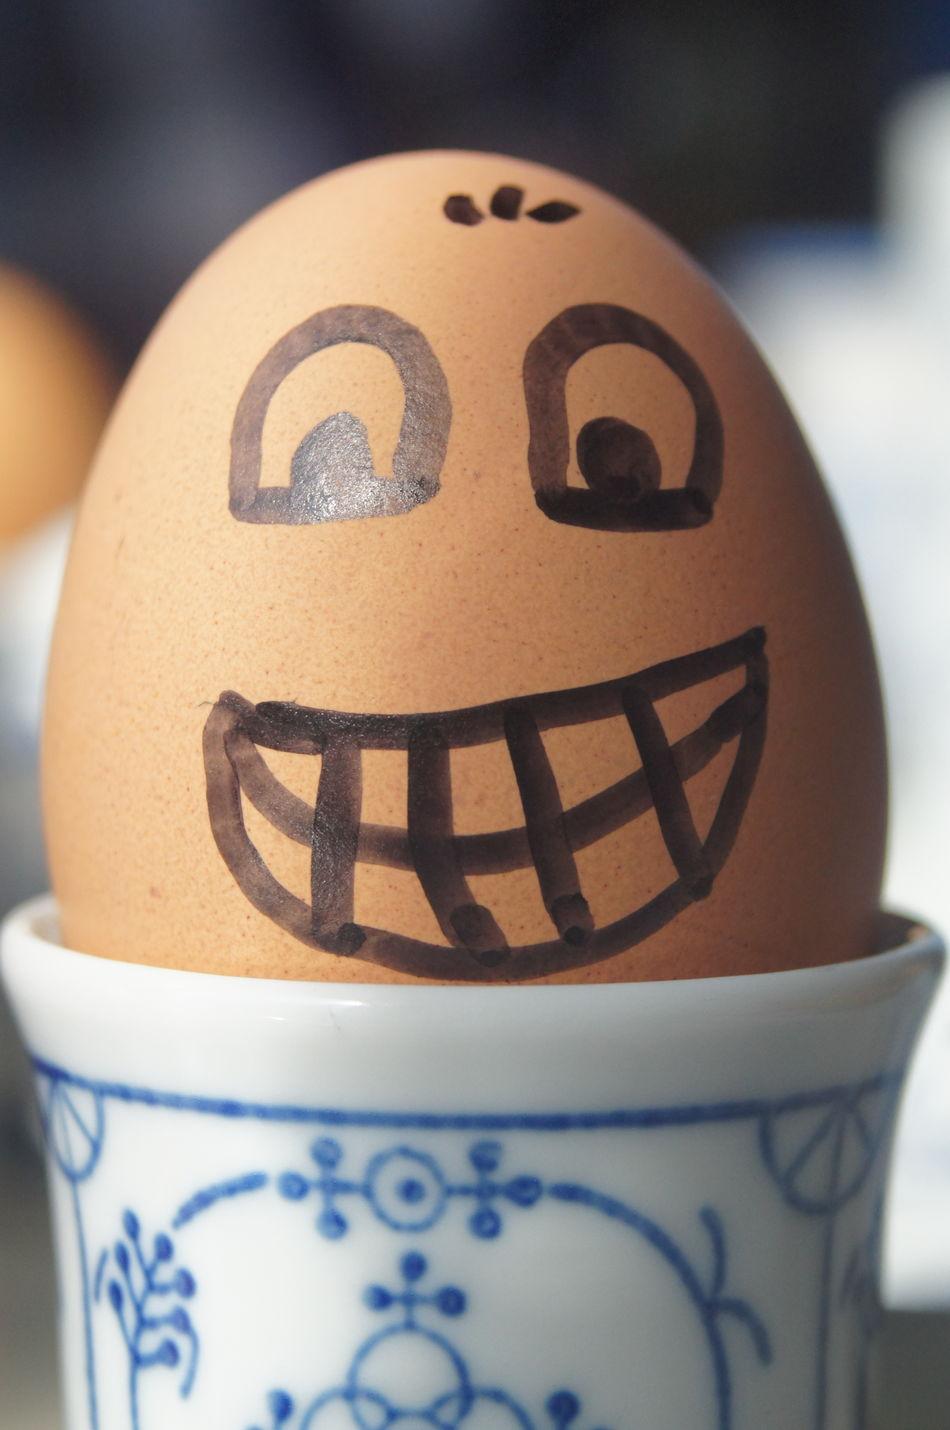 Close-up Egg Egg Face Ei Eier Eierkopf Faces Faces Of EyeEm Food Food And Drink Food And Drink Food And Drinks Food With Faces Freshness Healthy Eating Human Representation Indoors  Ready-to-eat